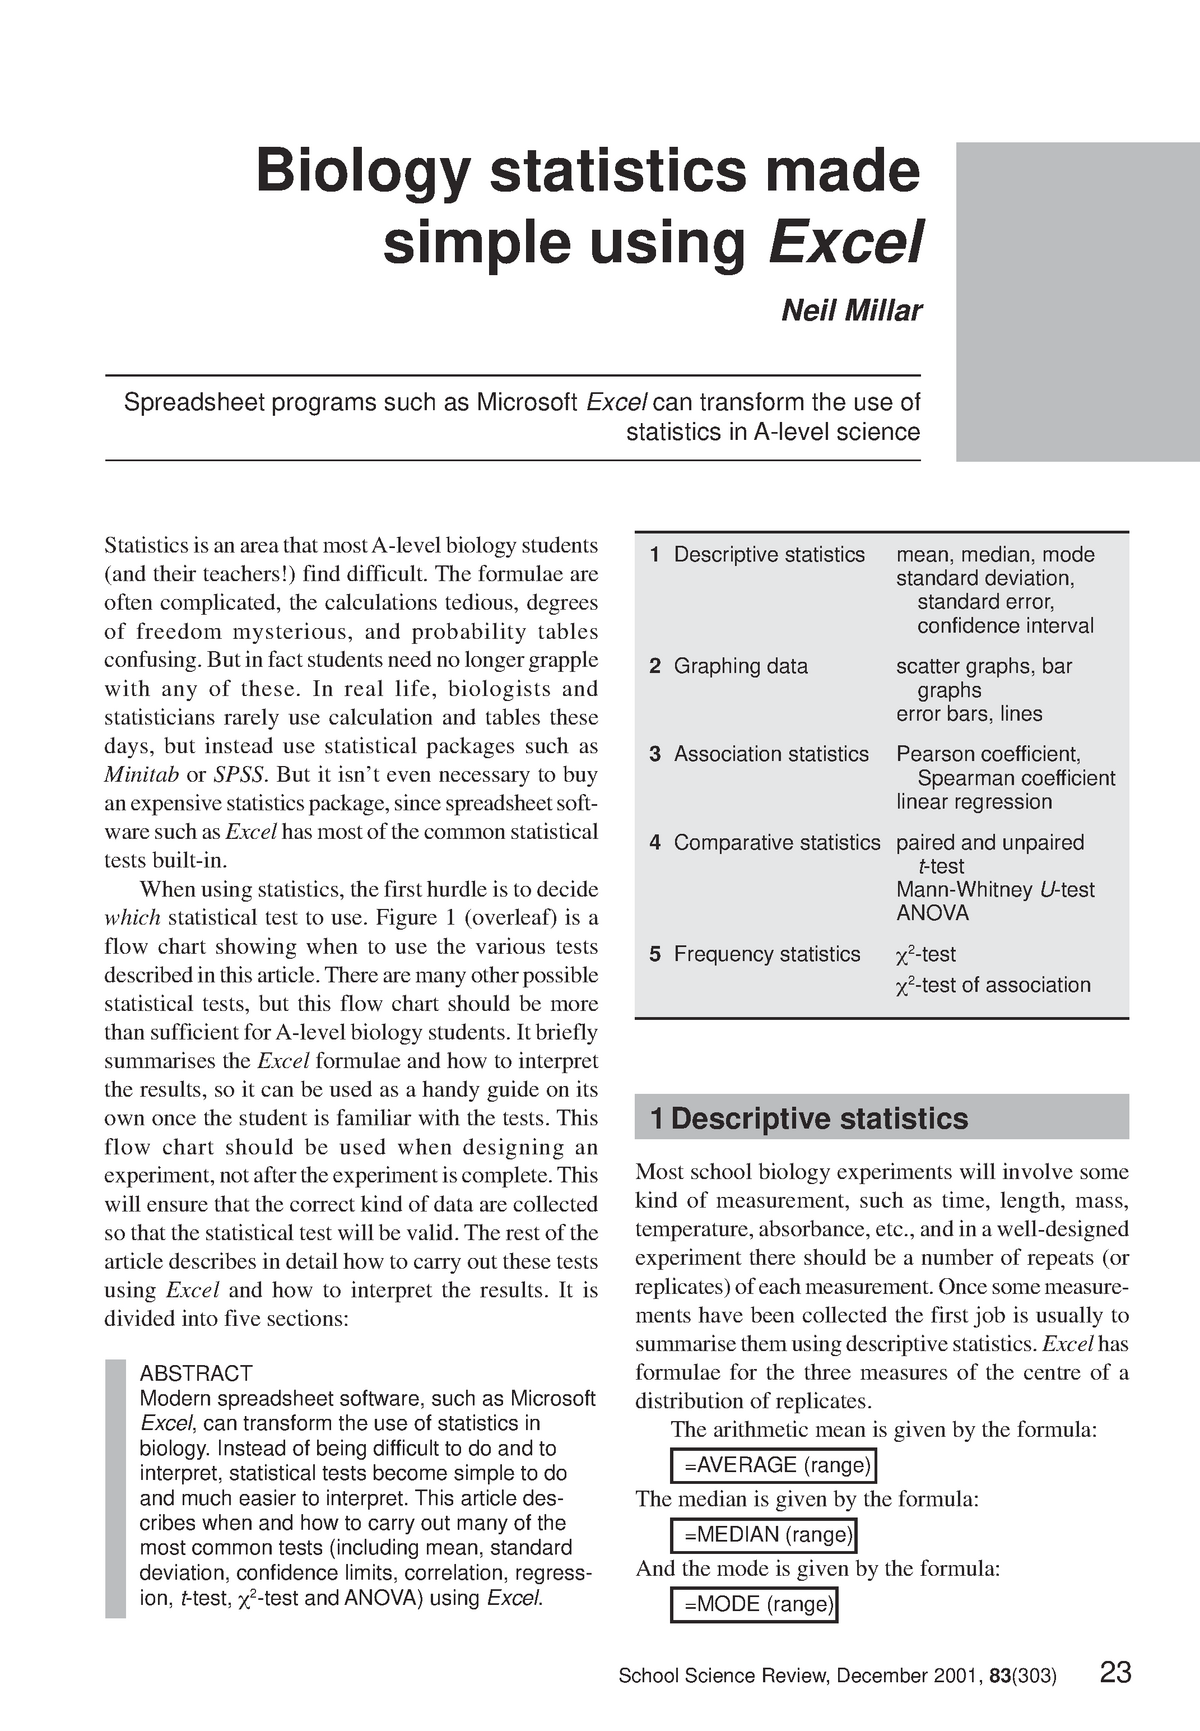 Millar 2001 Statistics Using Excel - BIOSC 101: Frontiers In Biol I